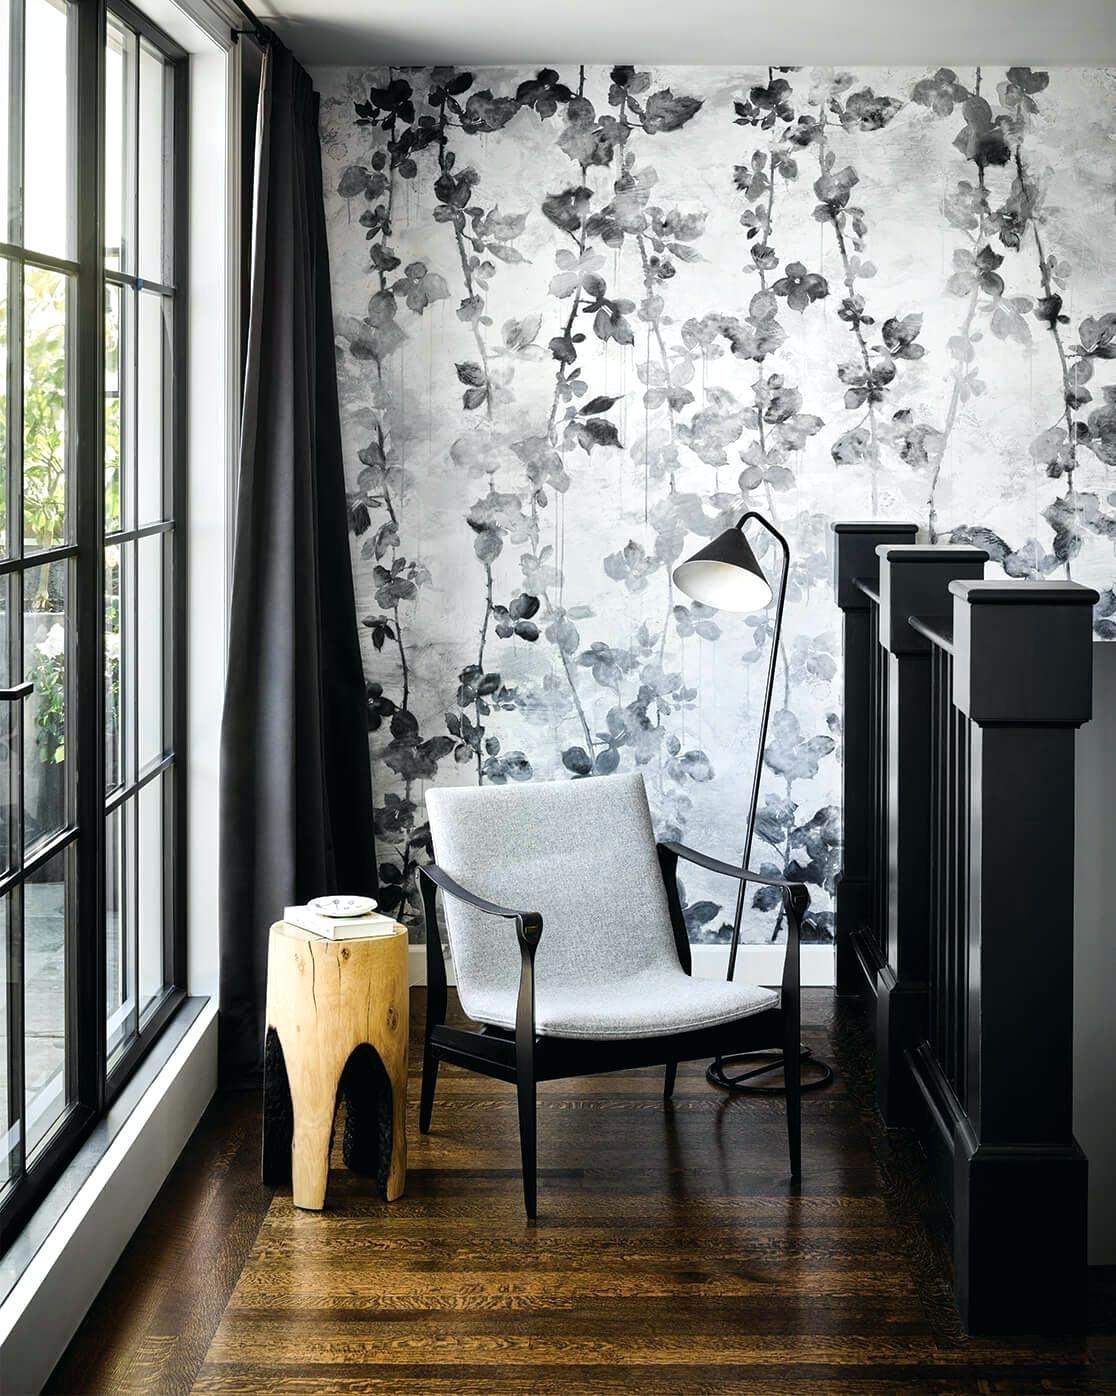 Modern Wallpaper Designs For Living Room Modern Wallpaper - Modern Wallpaper Design For Living Room - HD Wallpaper